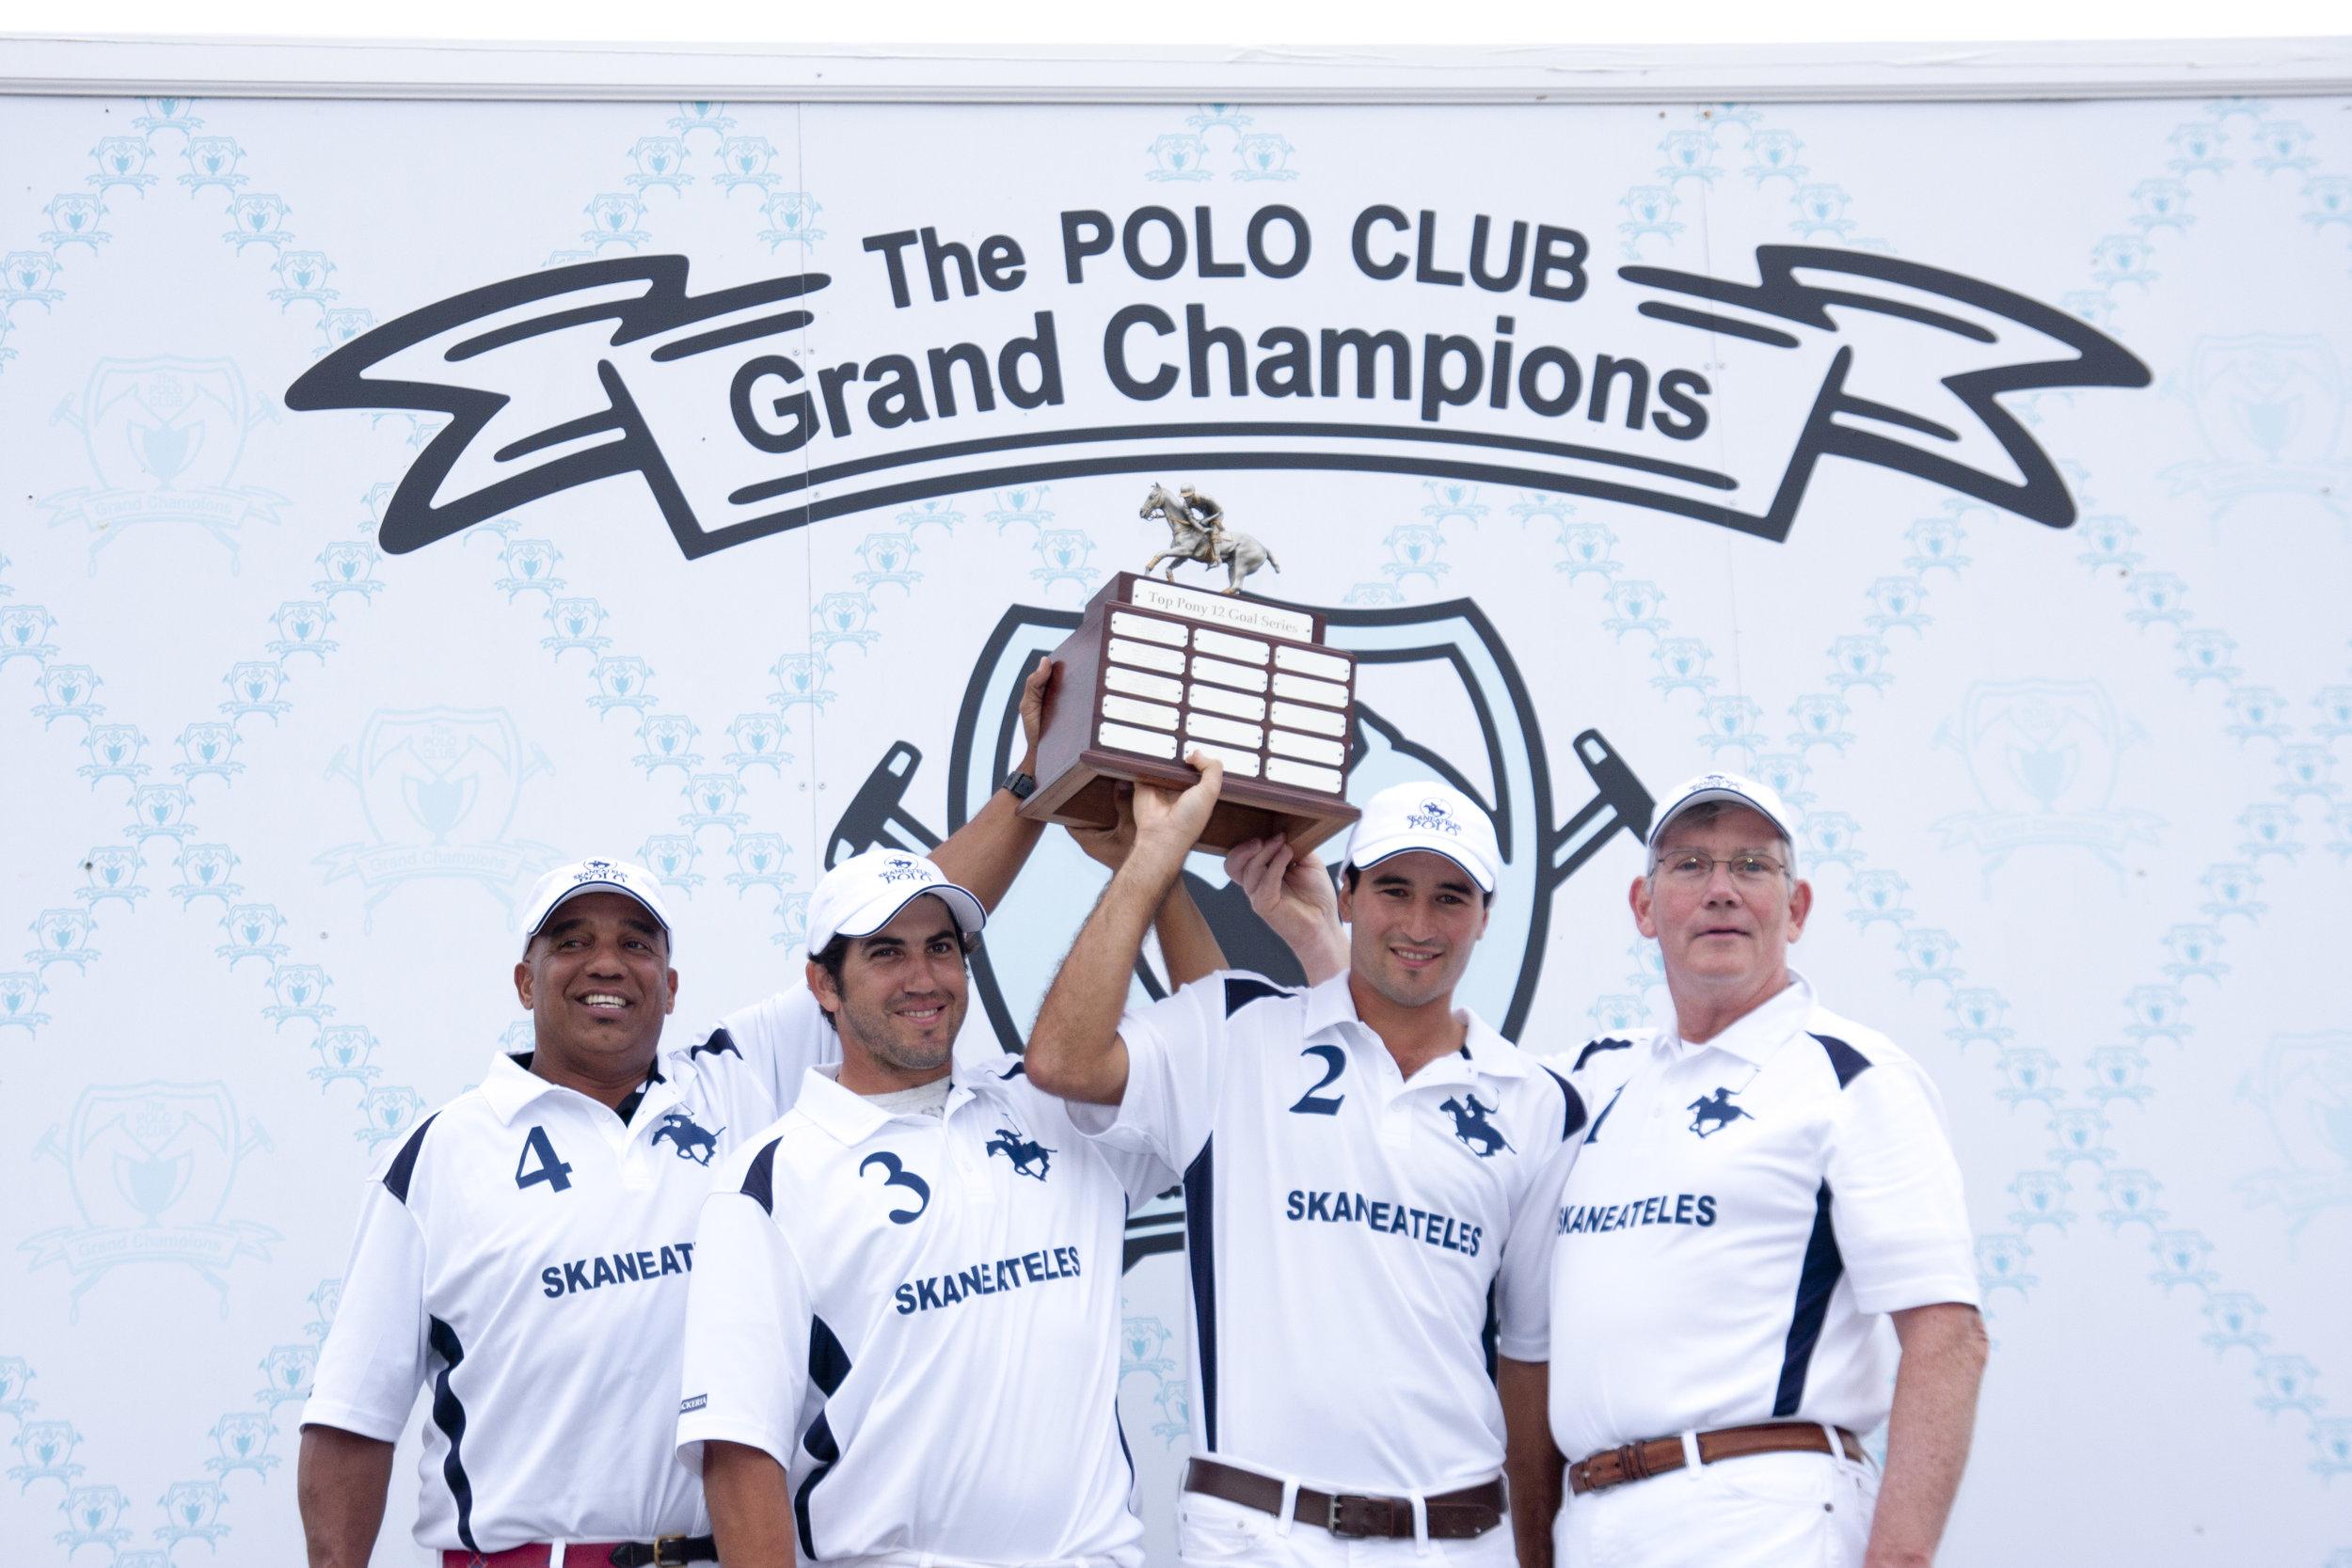 First-time Top Pony 12-Goal champion Skaneateles Cesar Jimenez, MVP Mariano Obregon, Costi Caset and Marty Cregg.